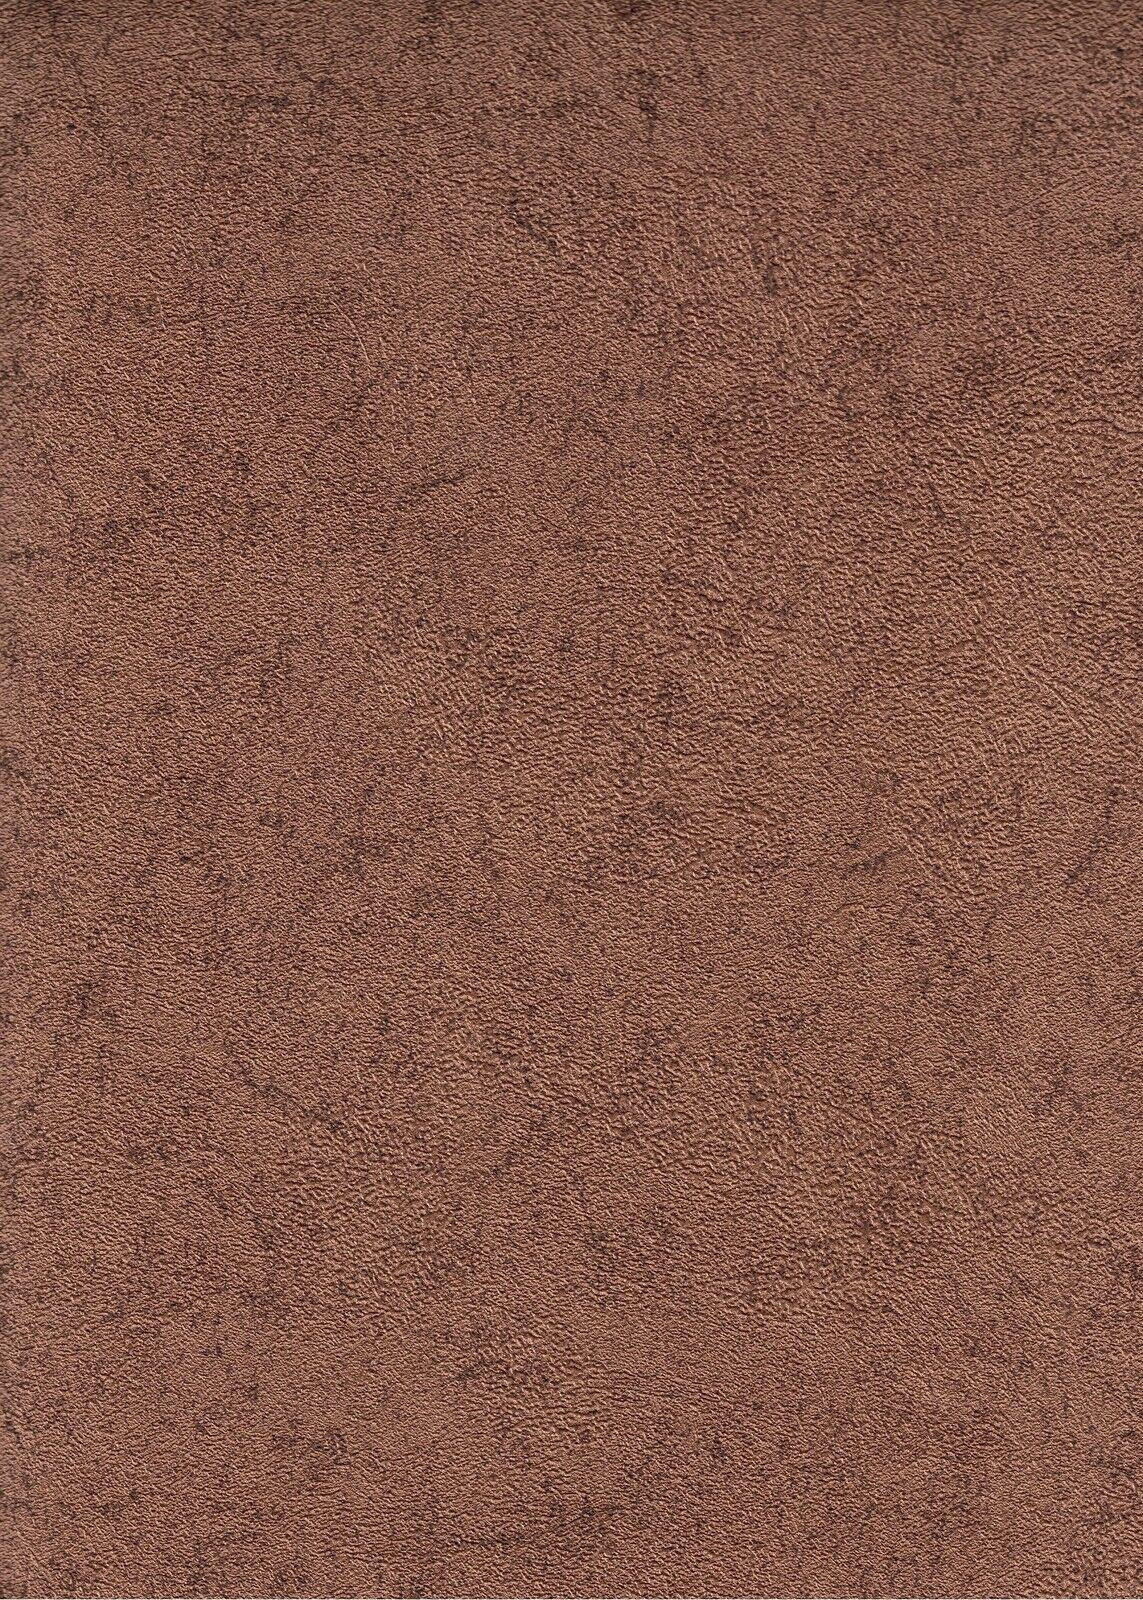 vliestapete uni struktur metallic kupfer bronze rost braun. Black Bedroom Furniture Sets. Home Design Ideas